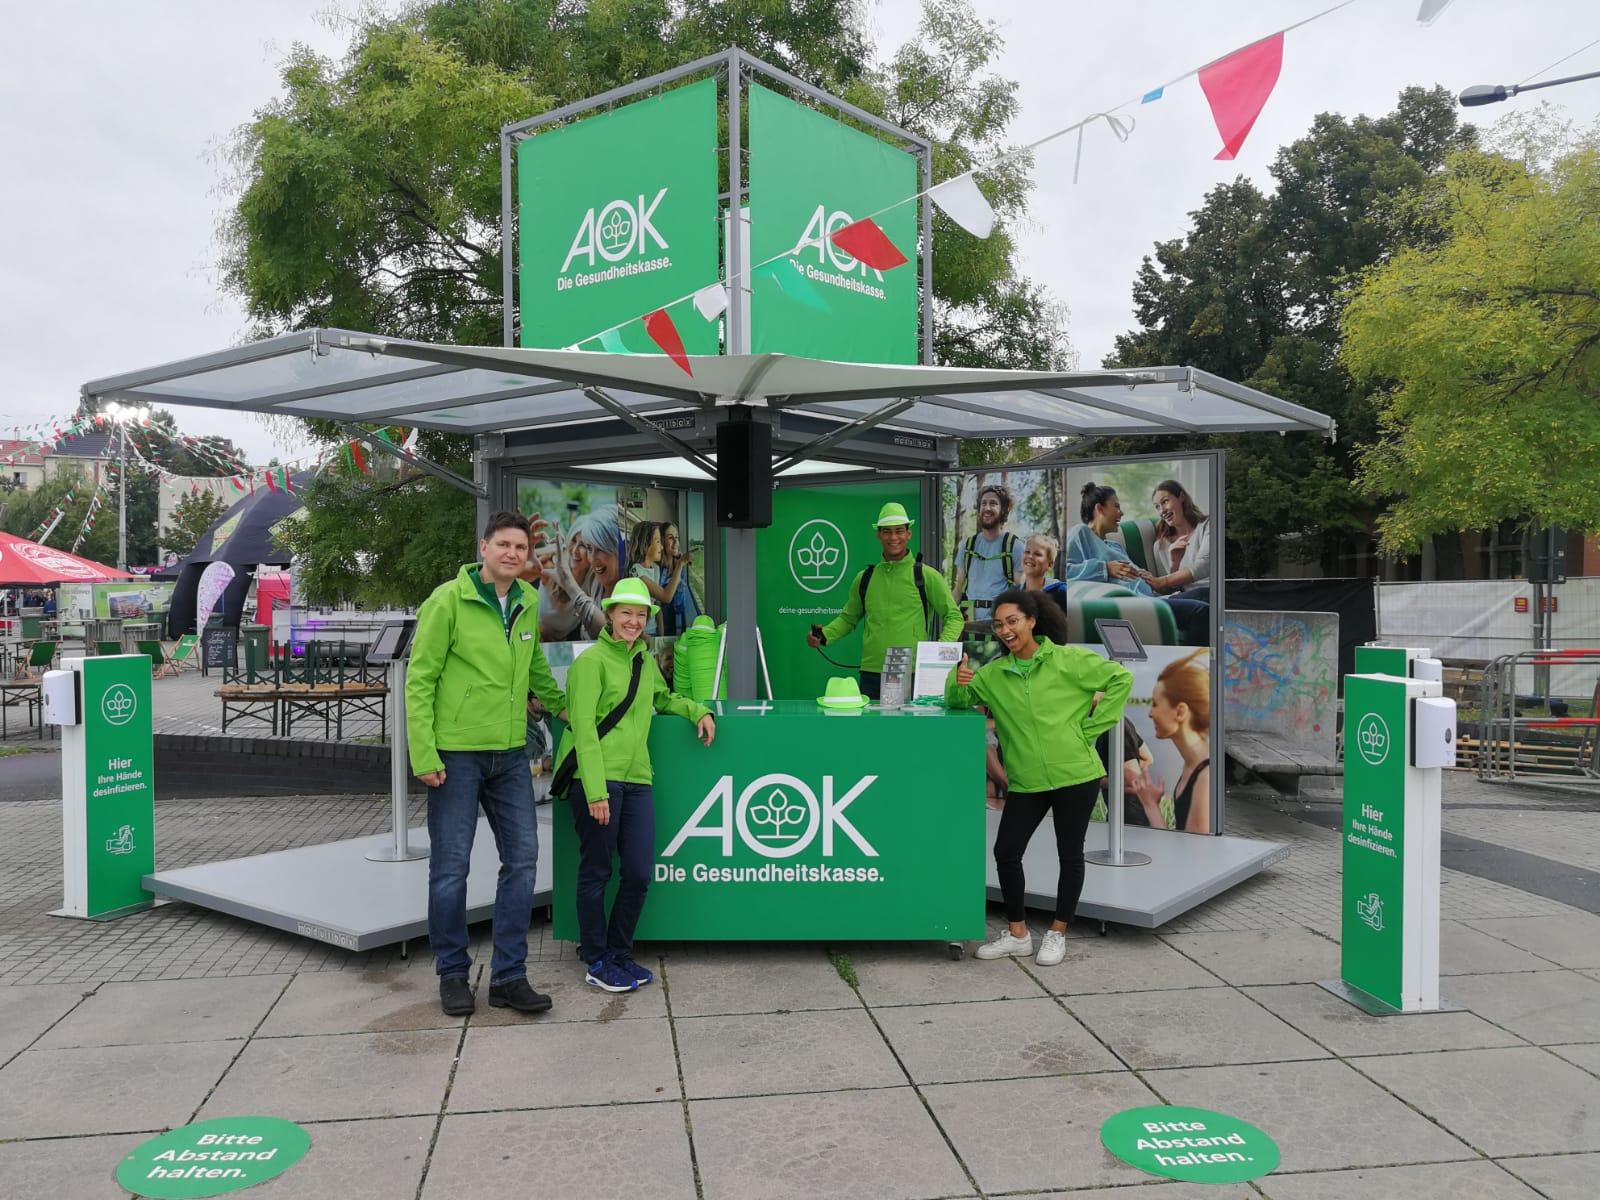 AOK_outdoor_promotion_mobile_booth_modulbox